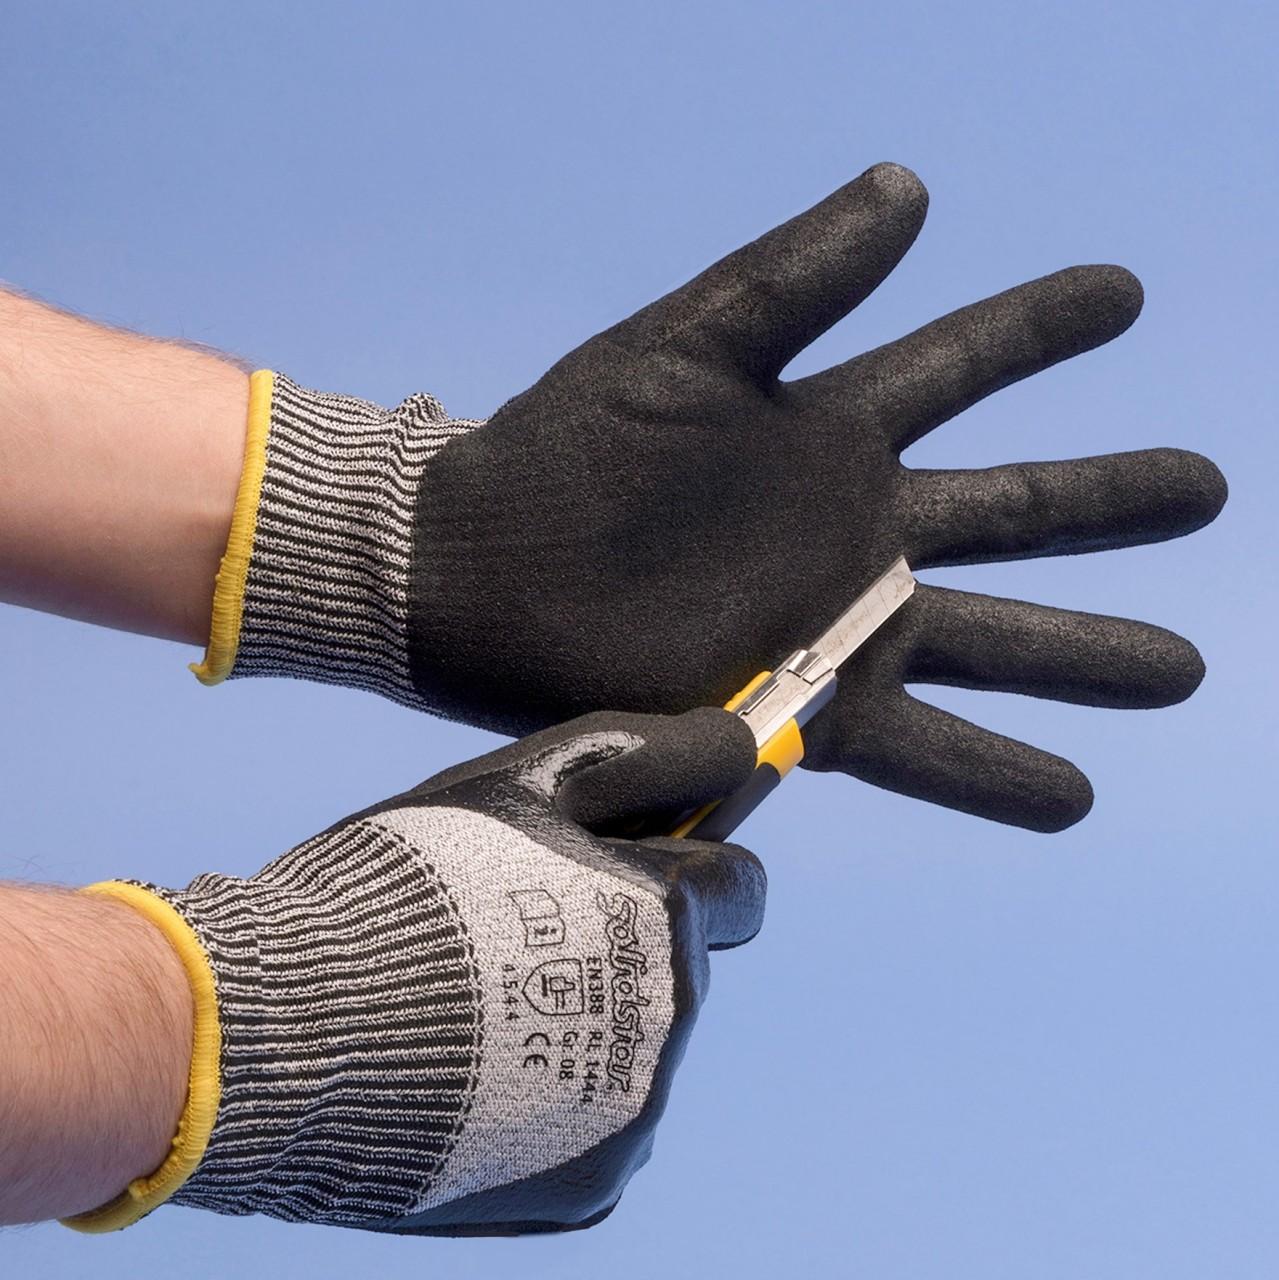 Schutzhandschuhe |CUT DOUBLE DIPPED